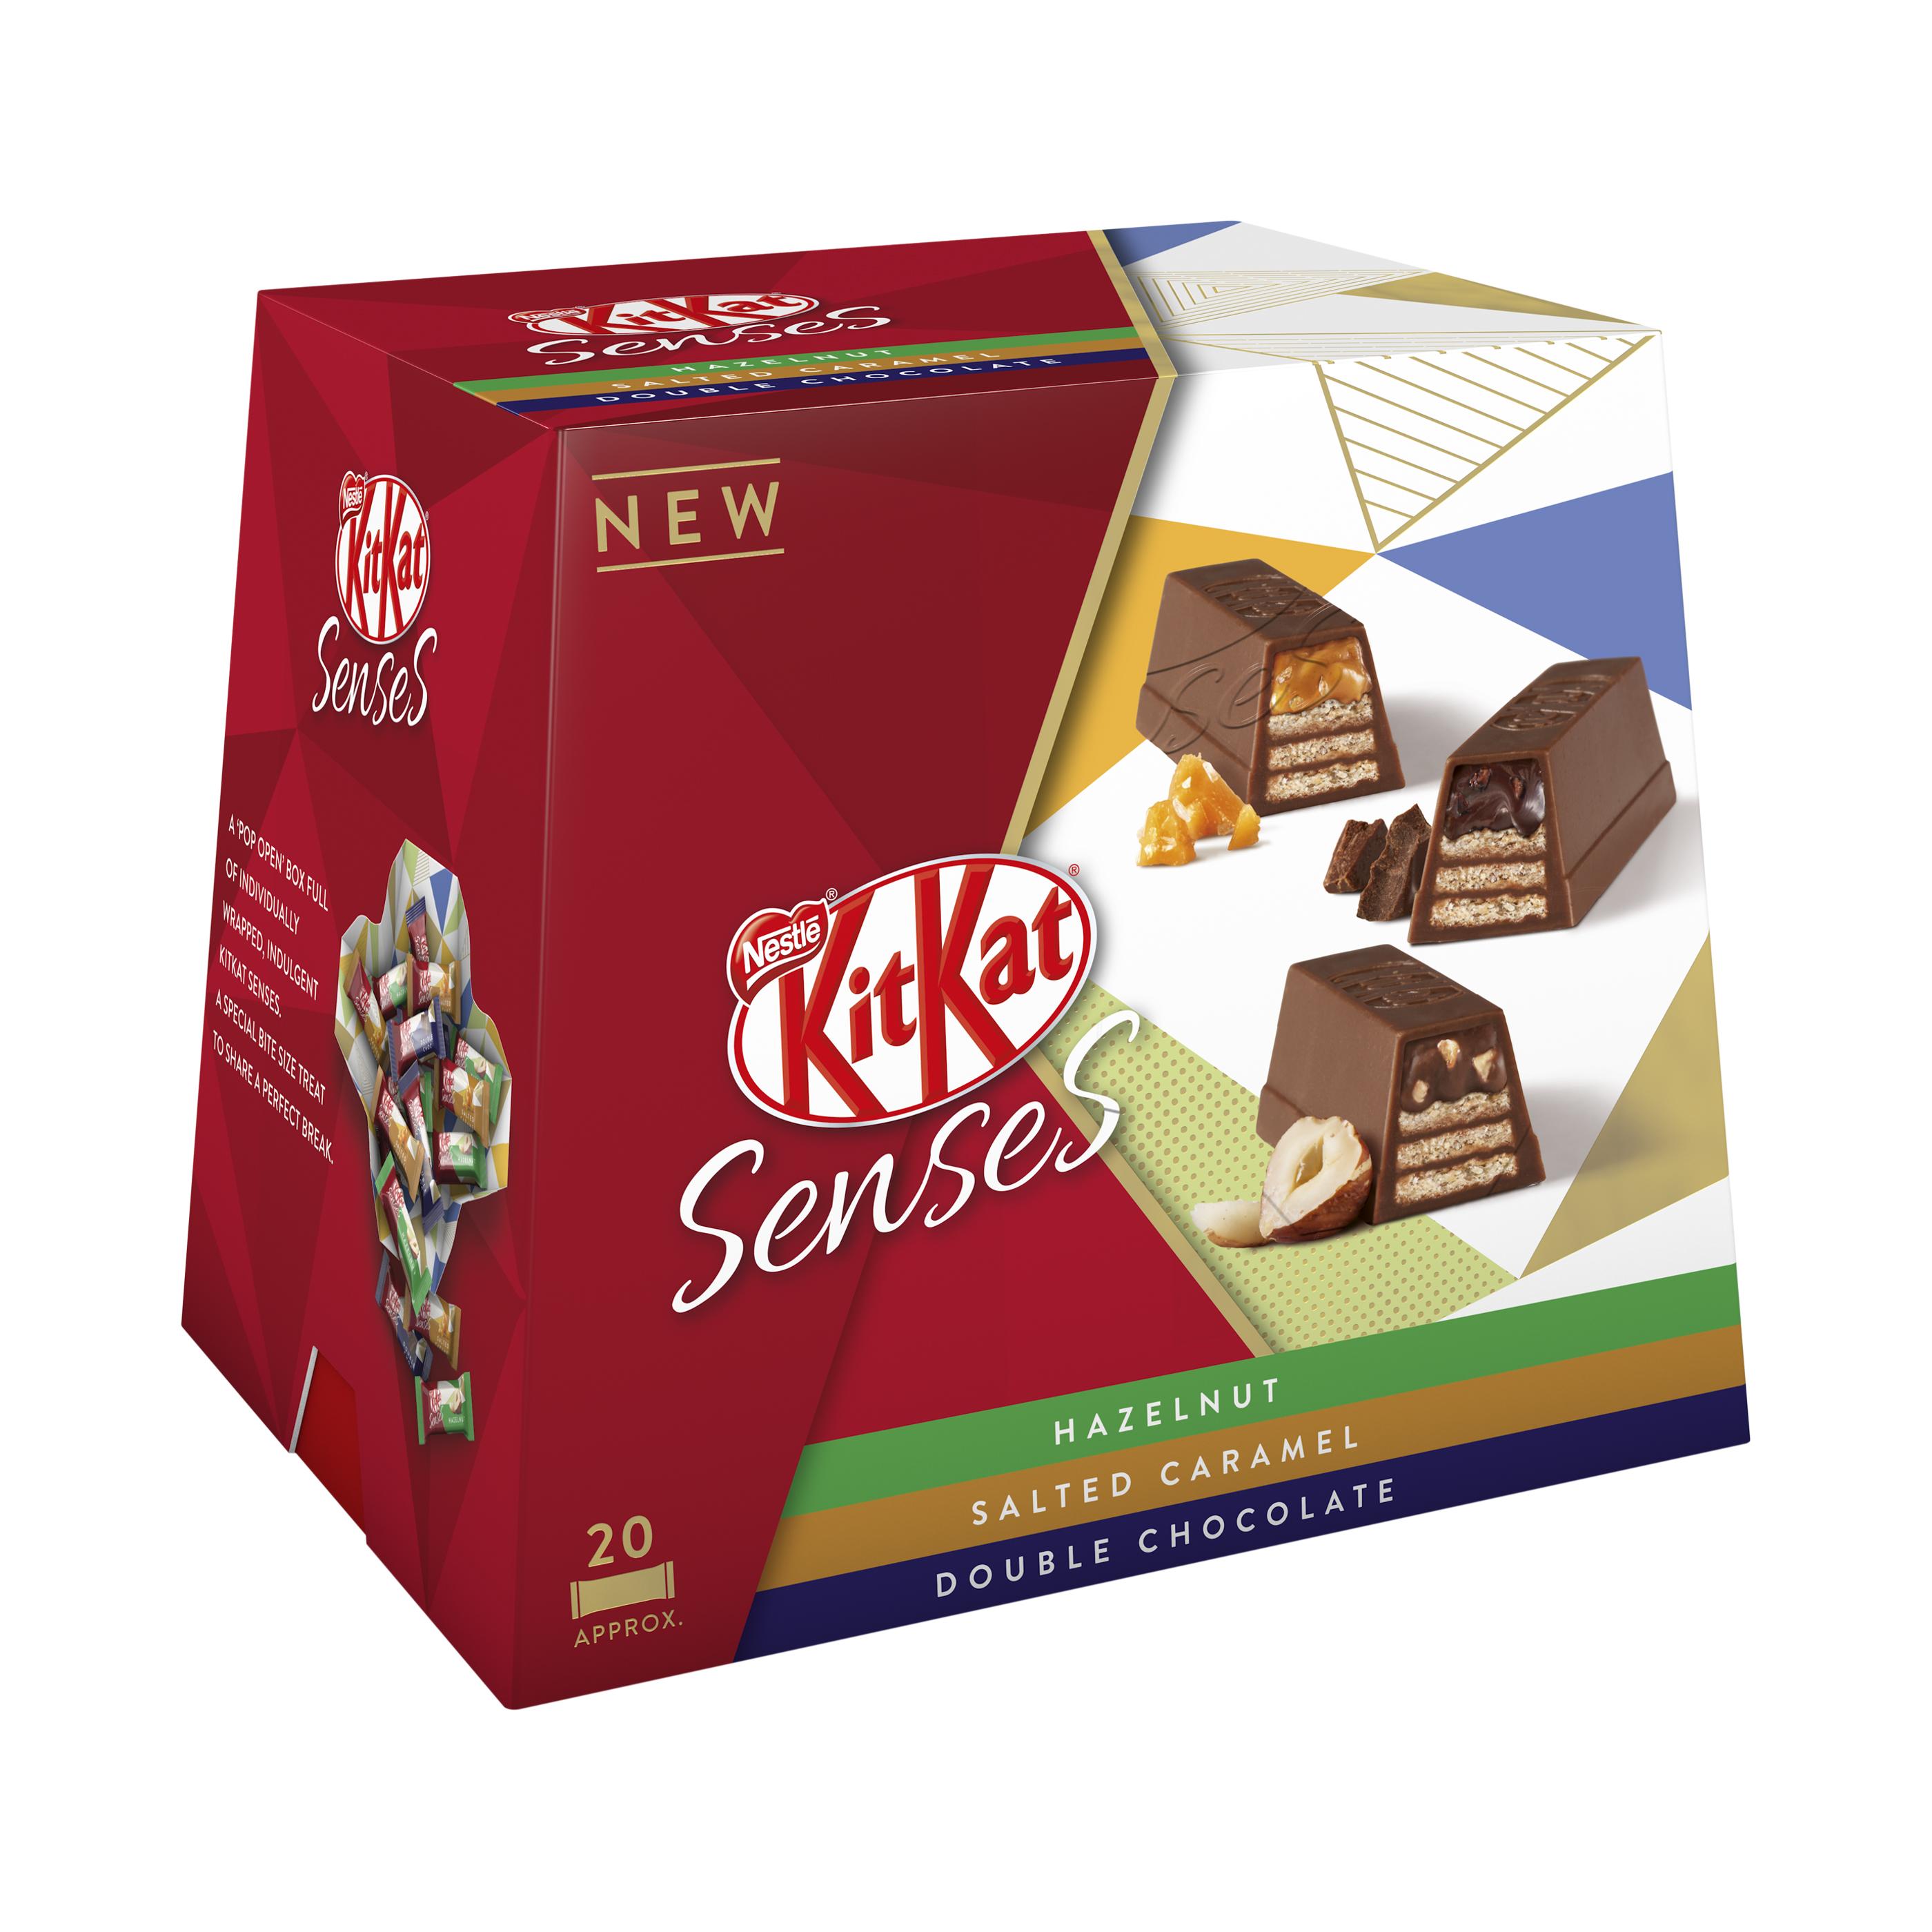 Biscuits Nestle Kit Kat Senses Assorted Box 20 Bite Size Pieces 200g Ref 12351140